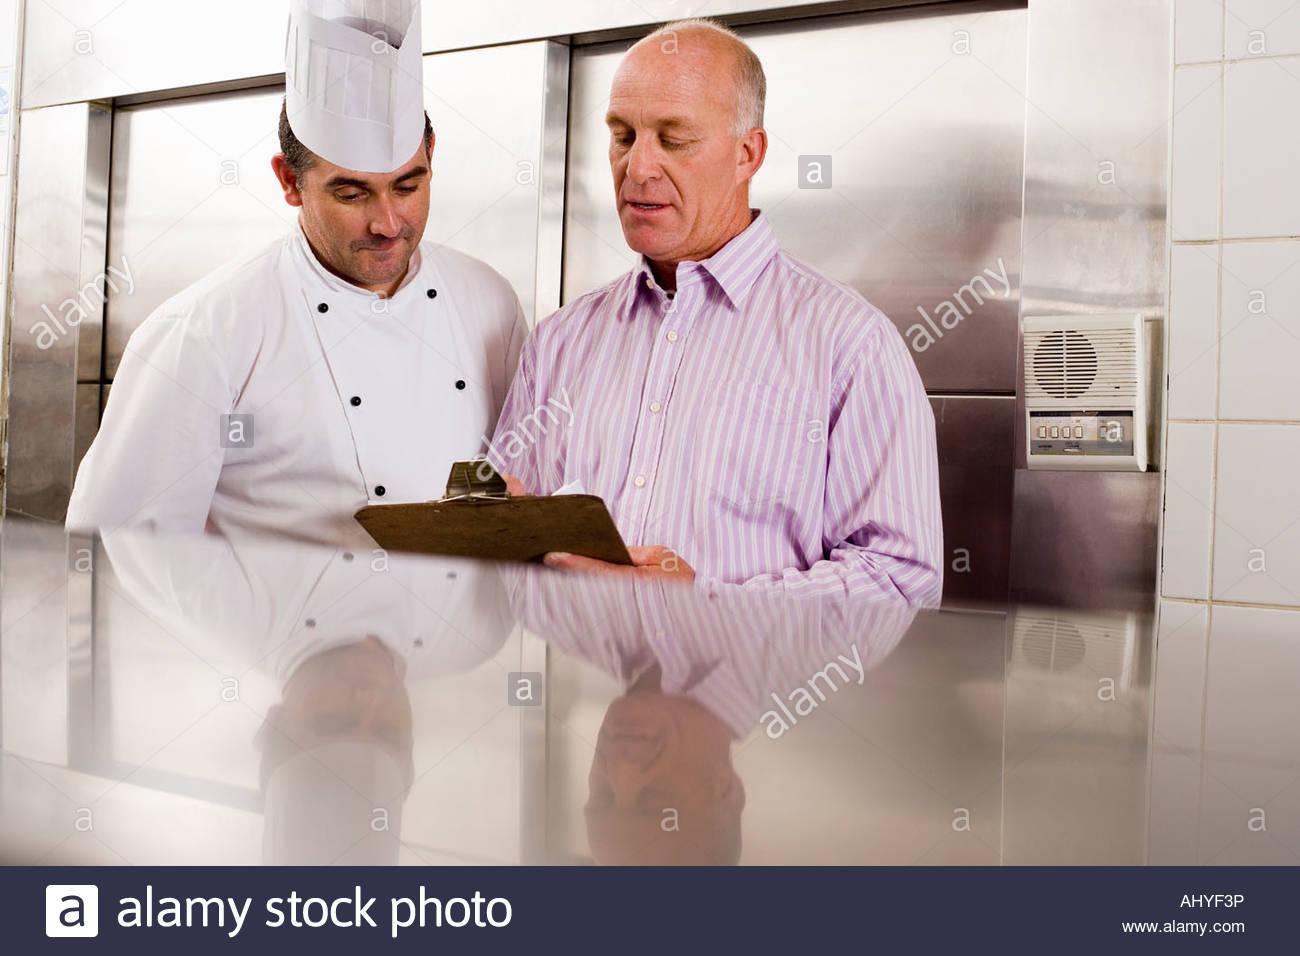 Kitchen manager job description salary